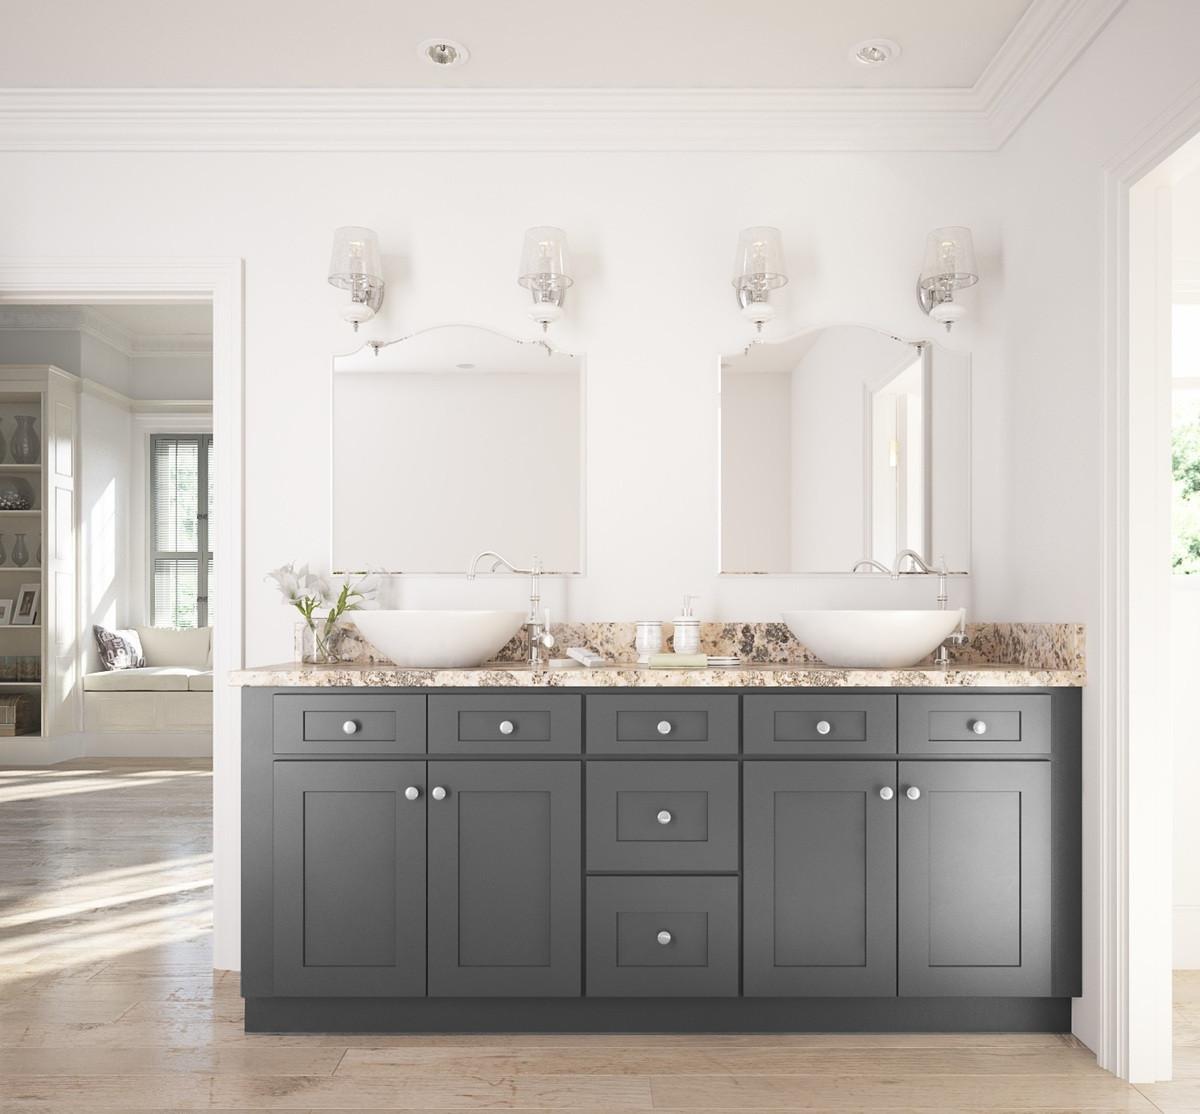 Cabinets To Go Bathroom Vanity  Graphite Grey Shaker Ready to Assemble Bathroom Vanities